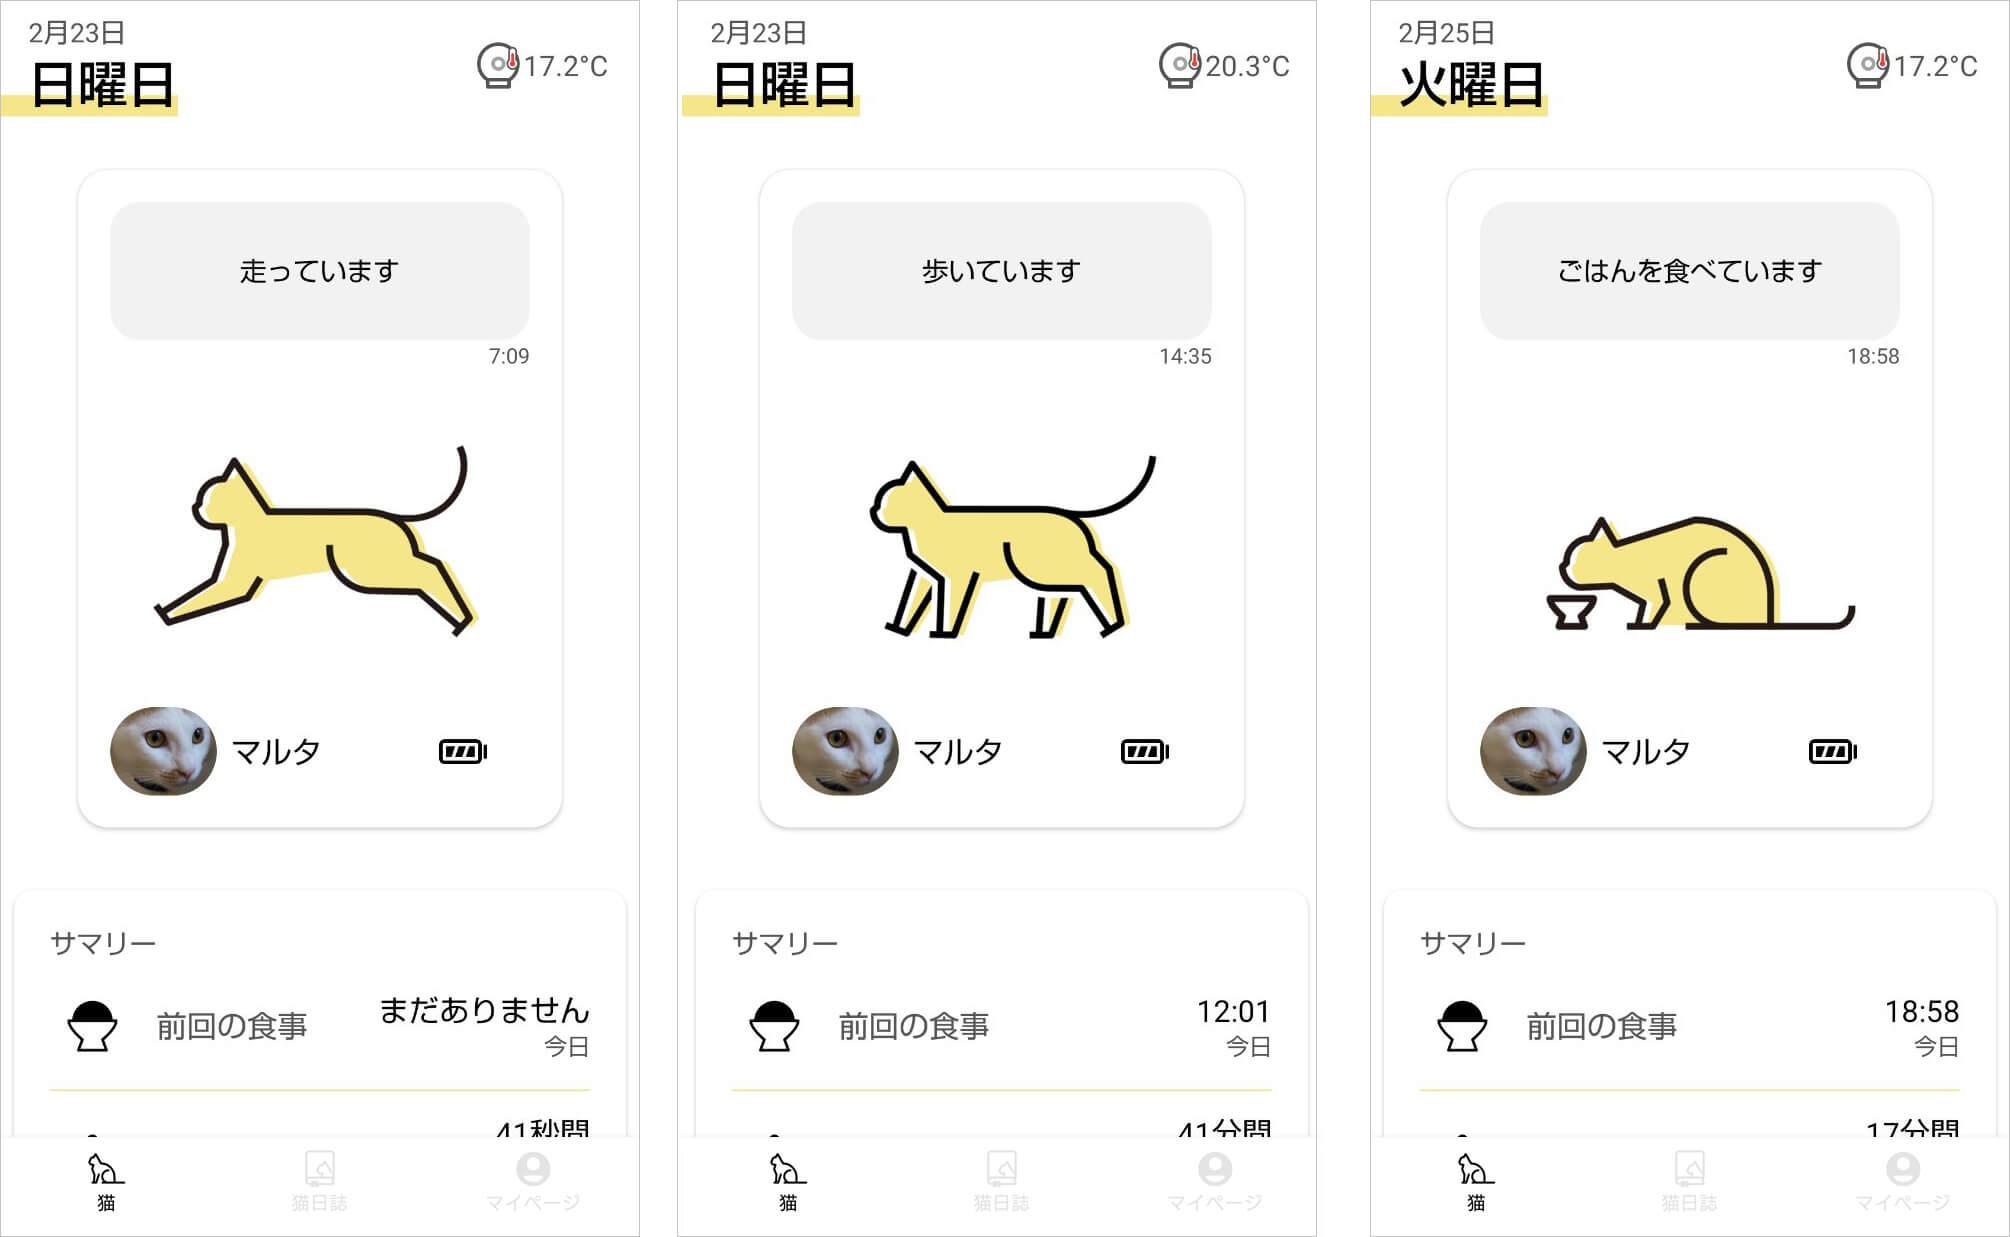 Catlogのある生活を体験!猫様の行動を見守ってみた 実際のCatlogアプリ画面 猫のイラストがかわいい